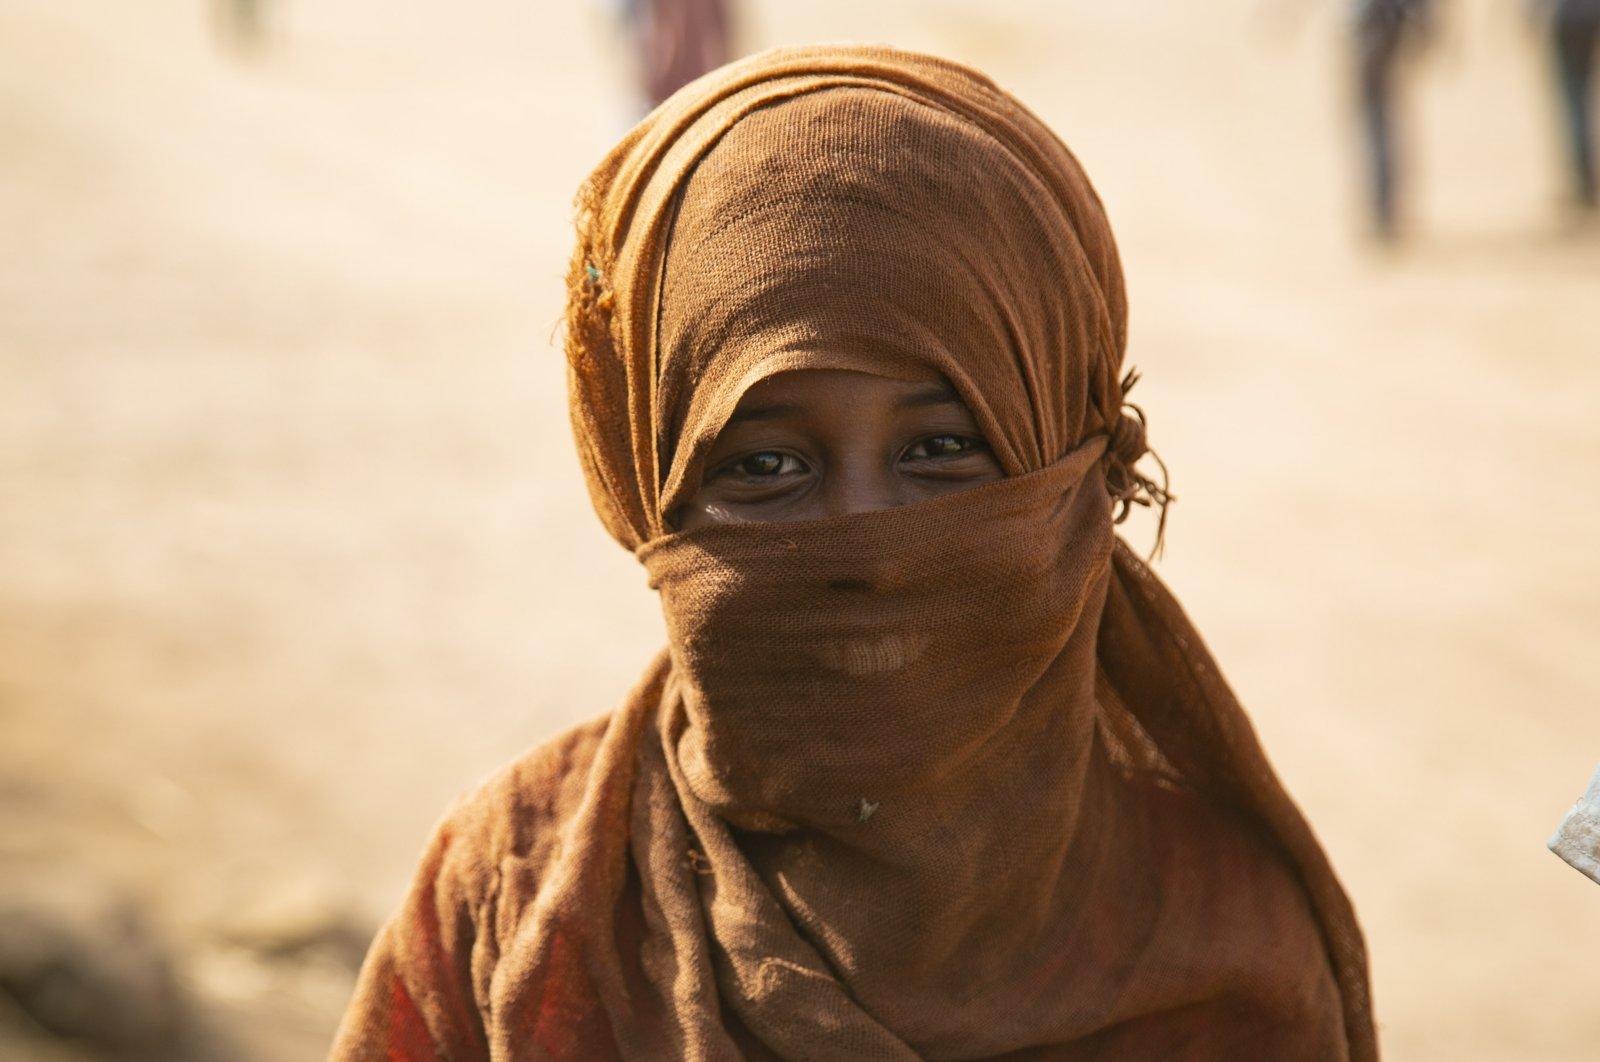 An Ethiopian refugee looks at the camera at a refugee camp in Al Qadarif state, Sudan, Feb. 19, 2021. (AA Photo)